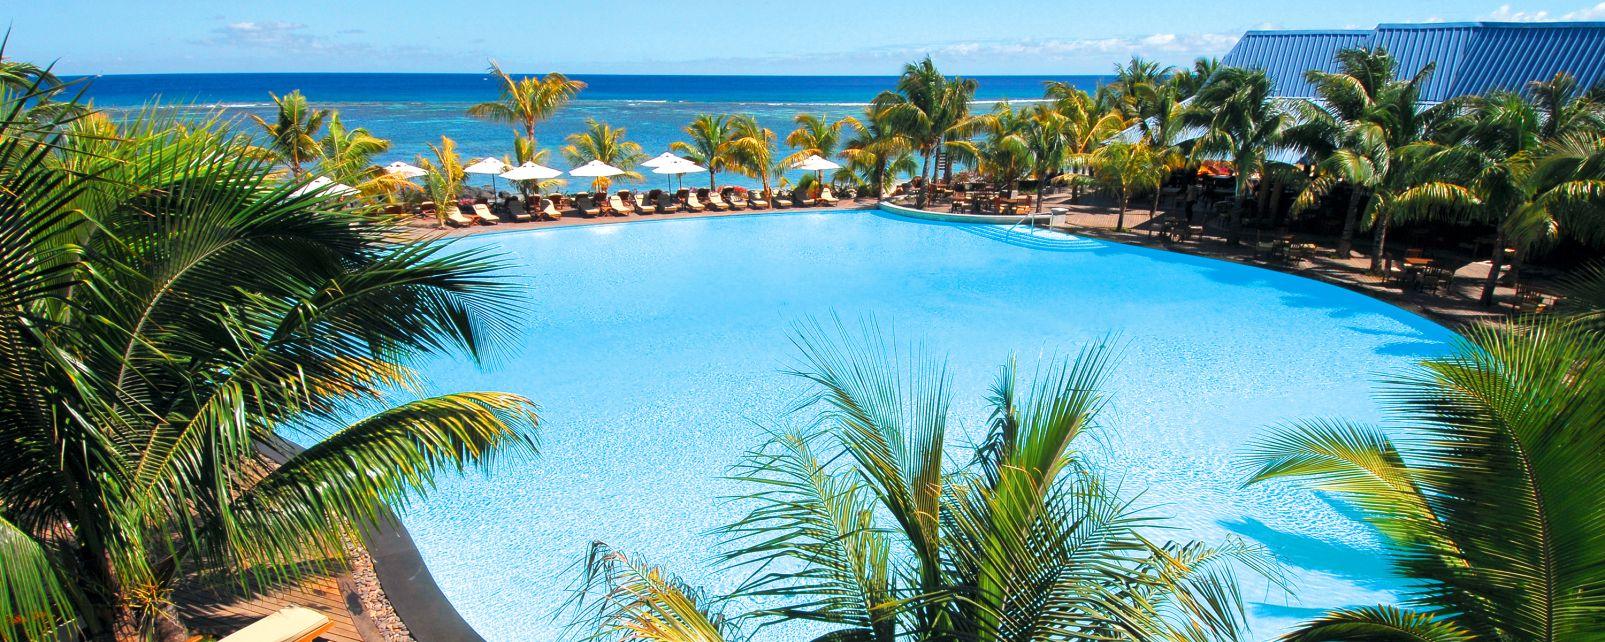 Hotel Le Victoria, Pointe Aux Piments, Isola Mauritius